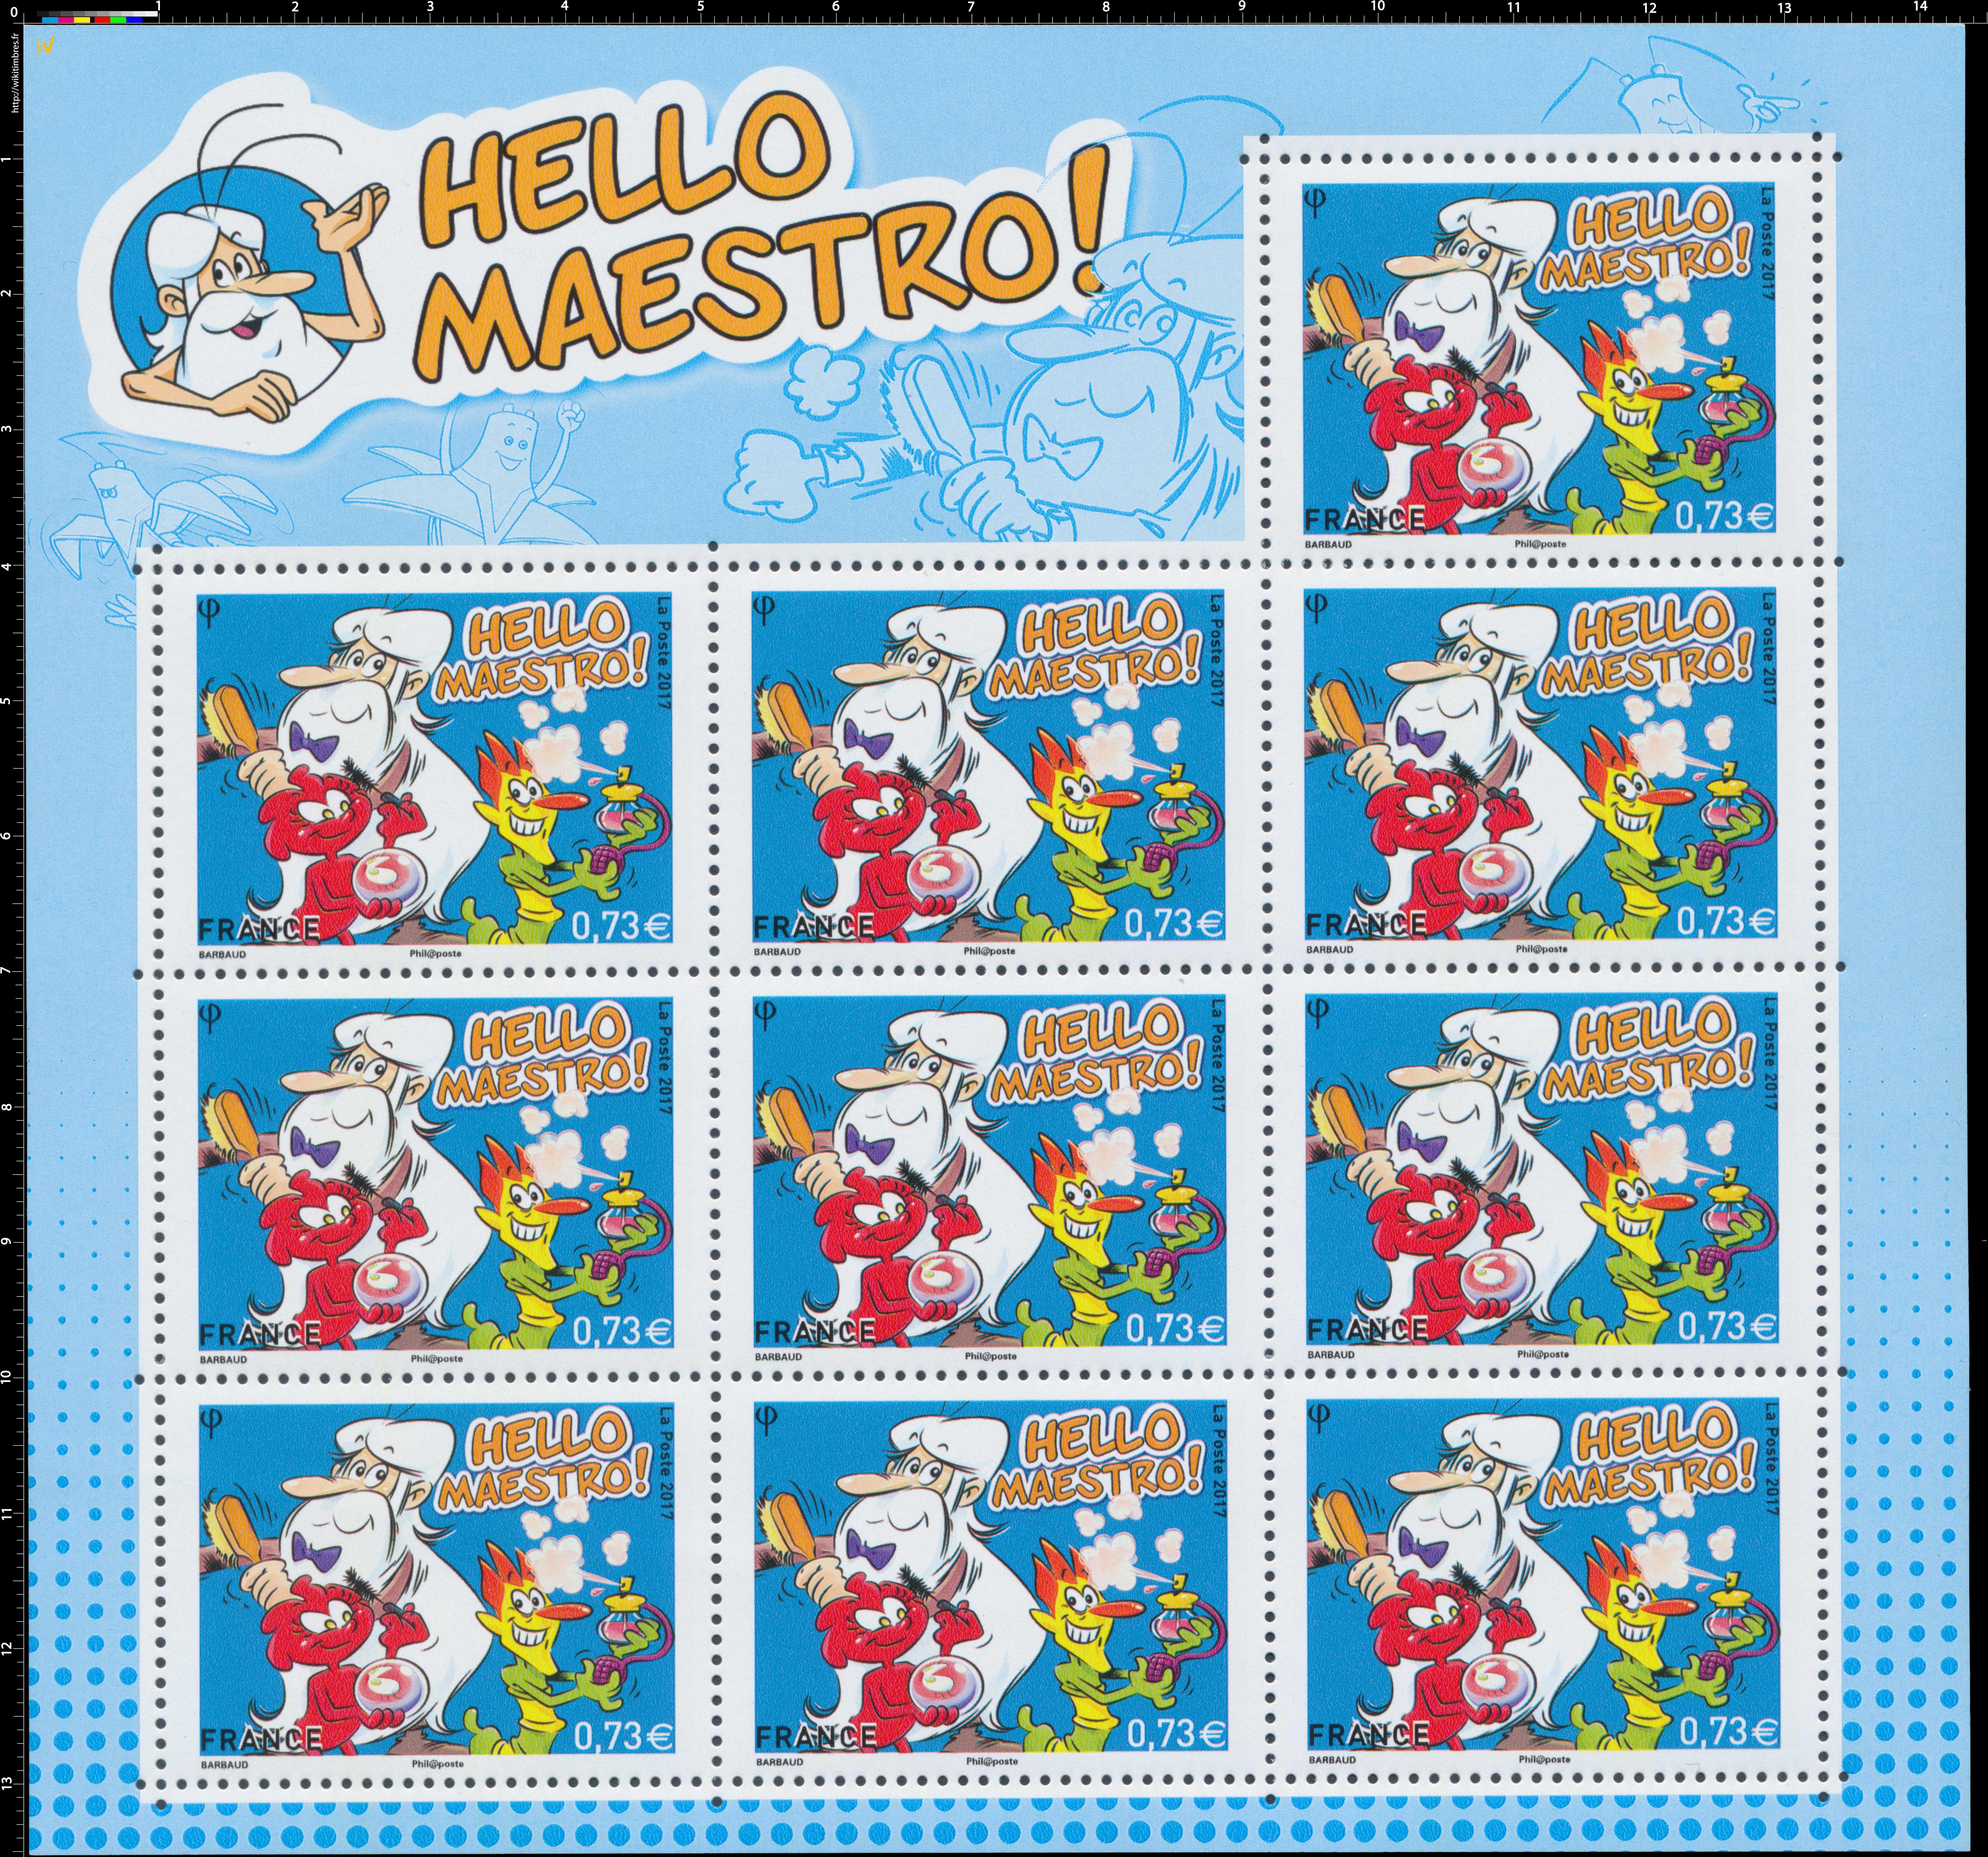 2017 Hello Maestro !